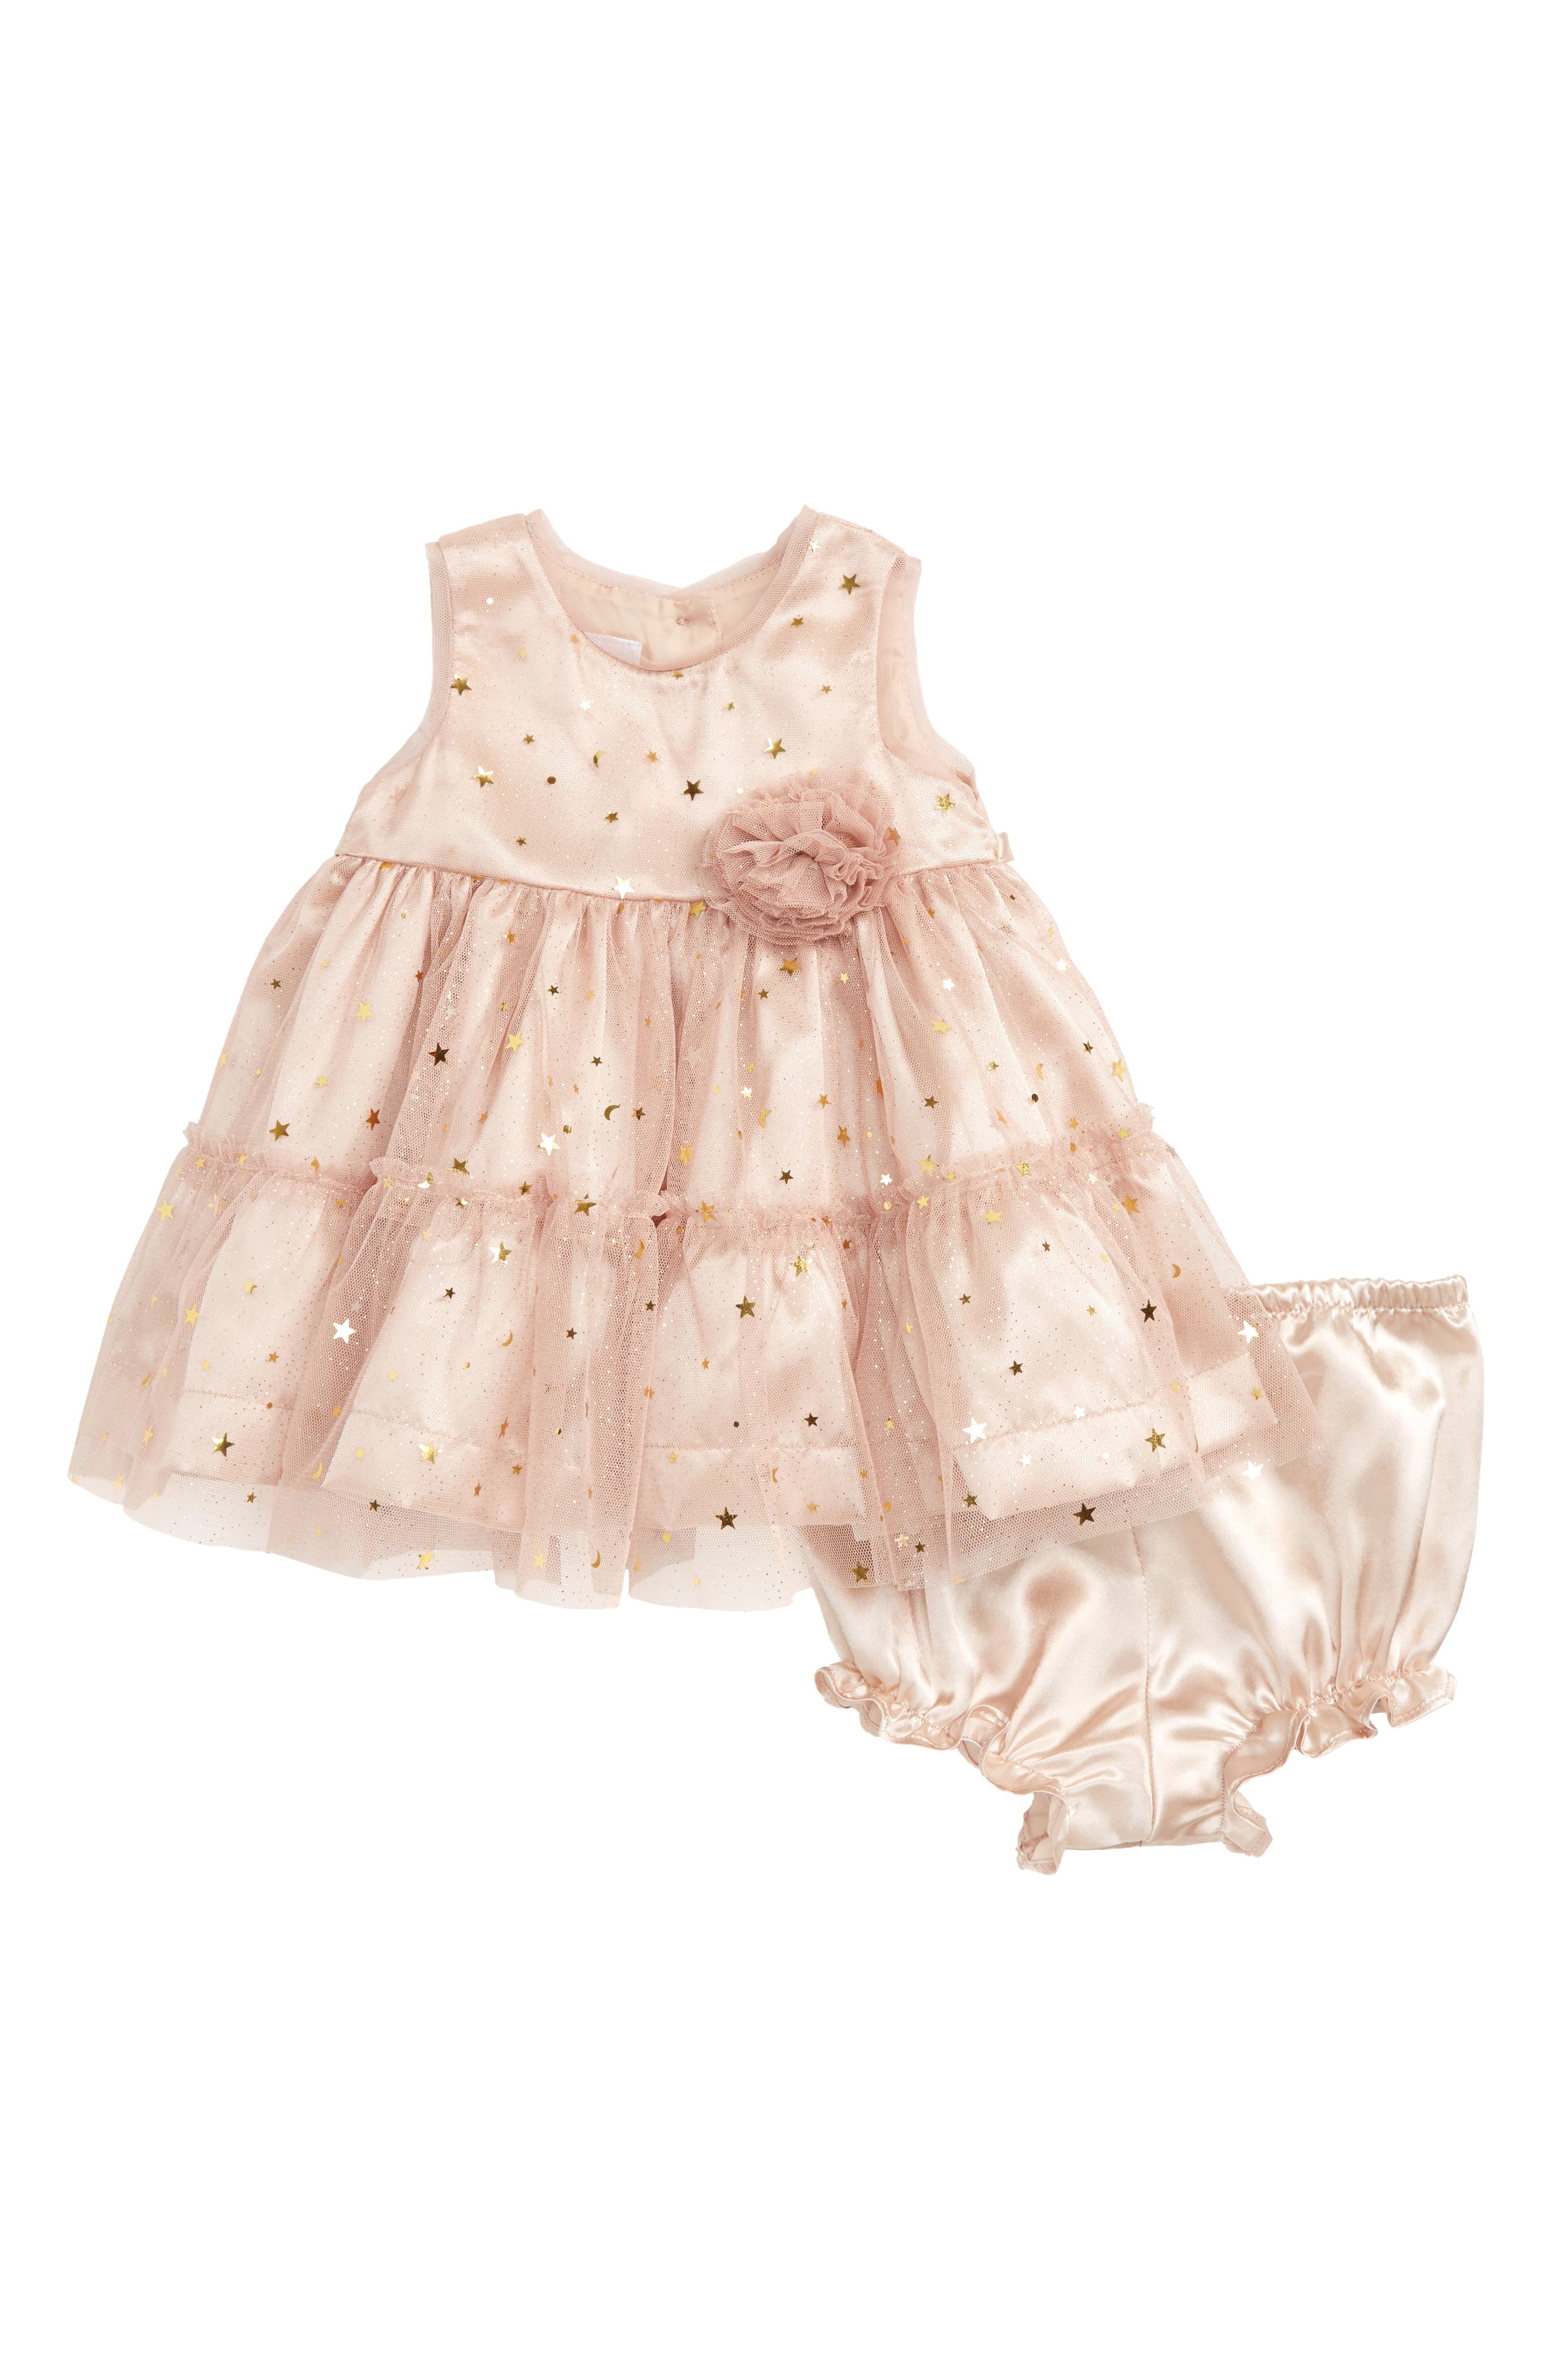 Gold Star Dress,                         Main,                         color, Pink/ Gold